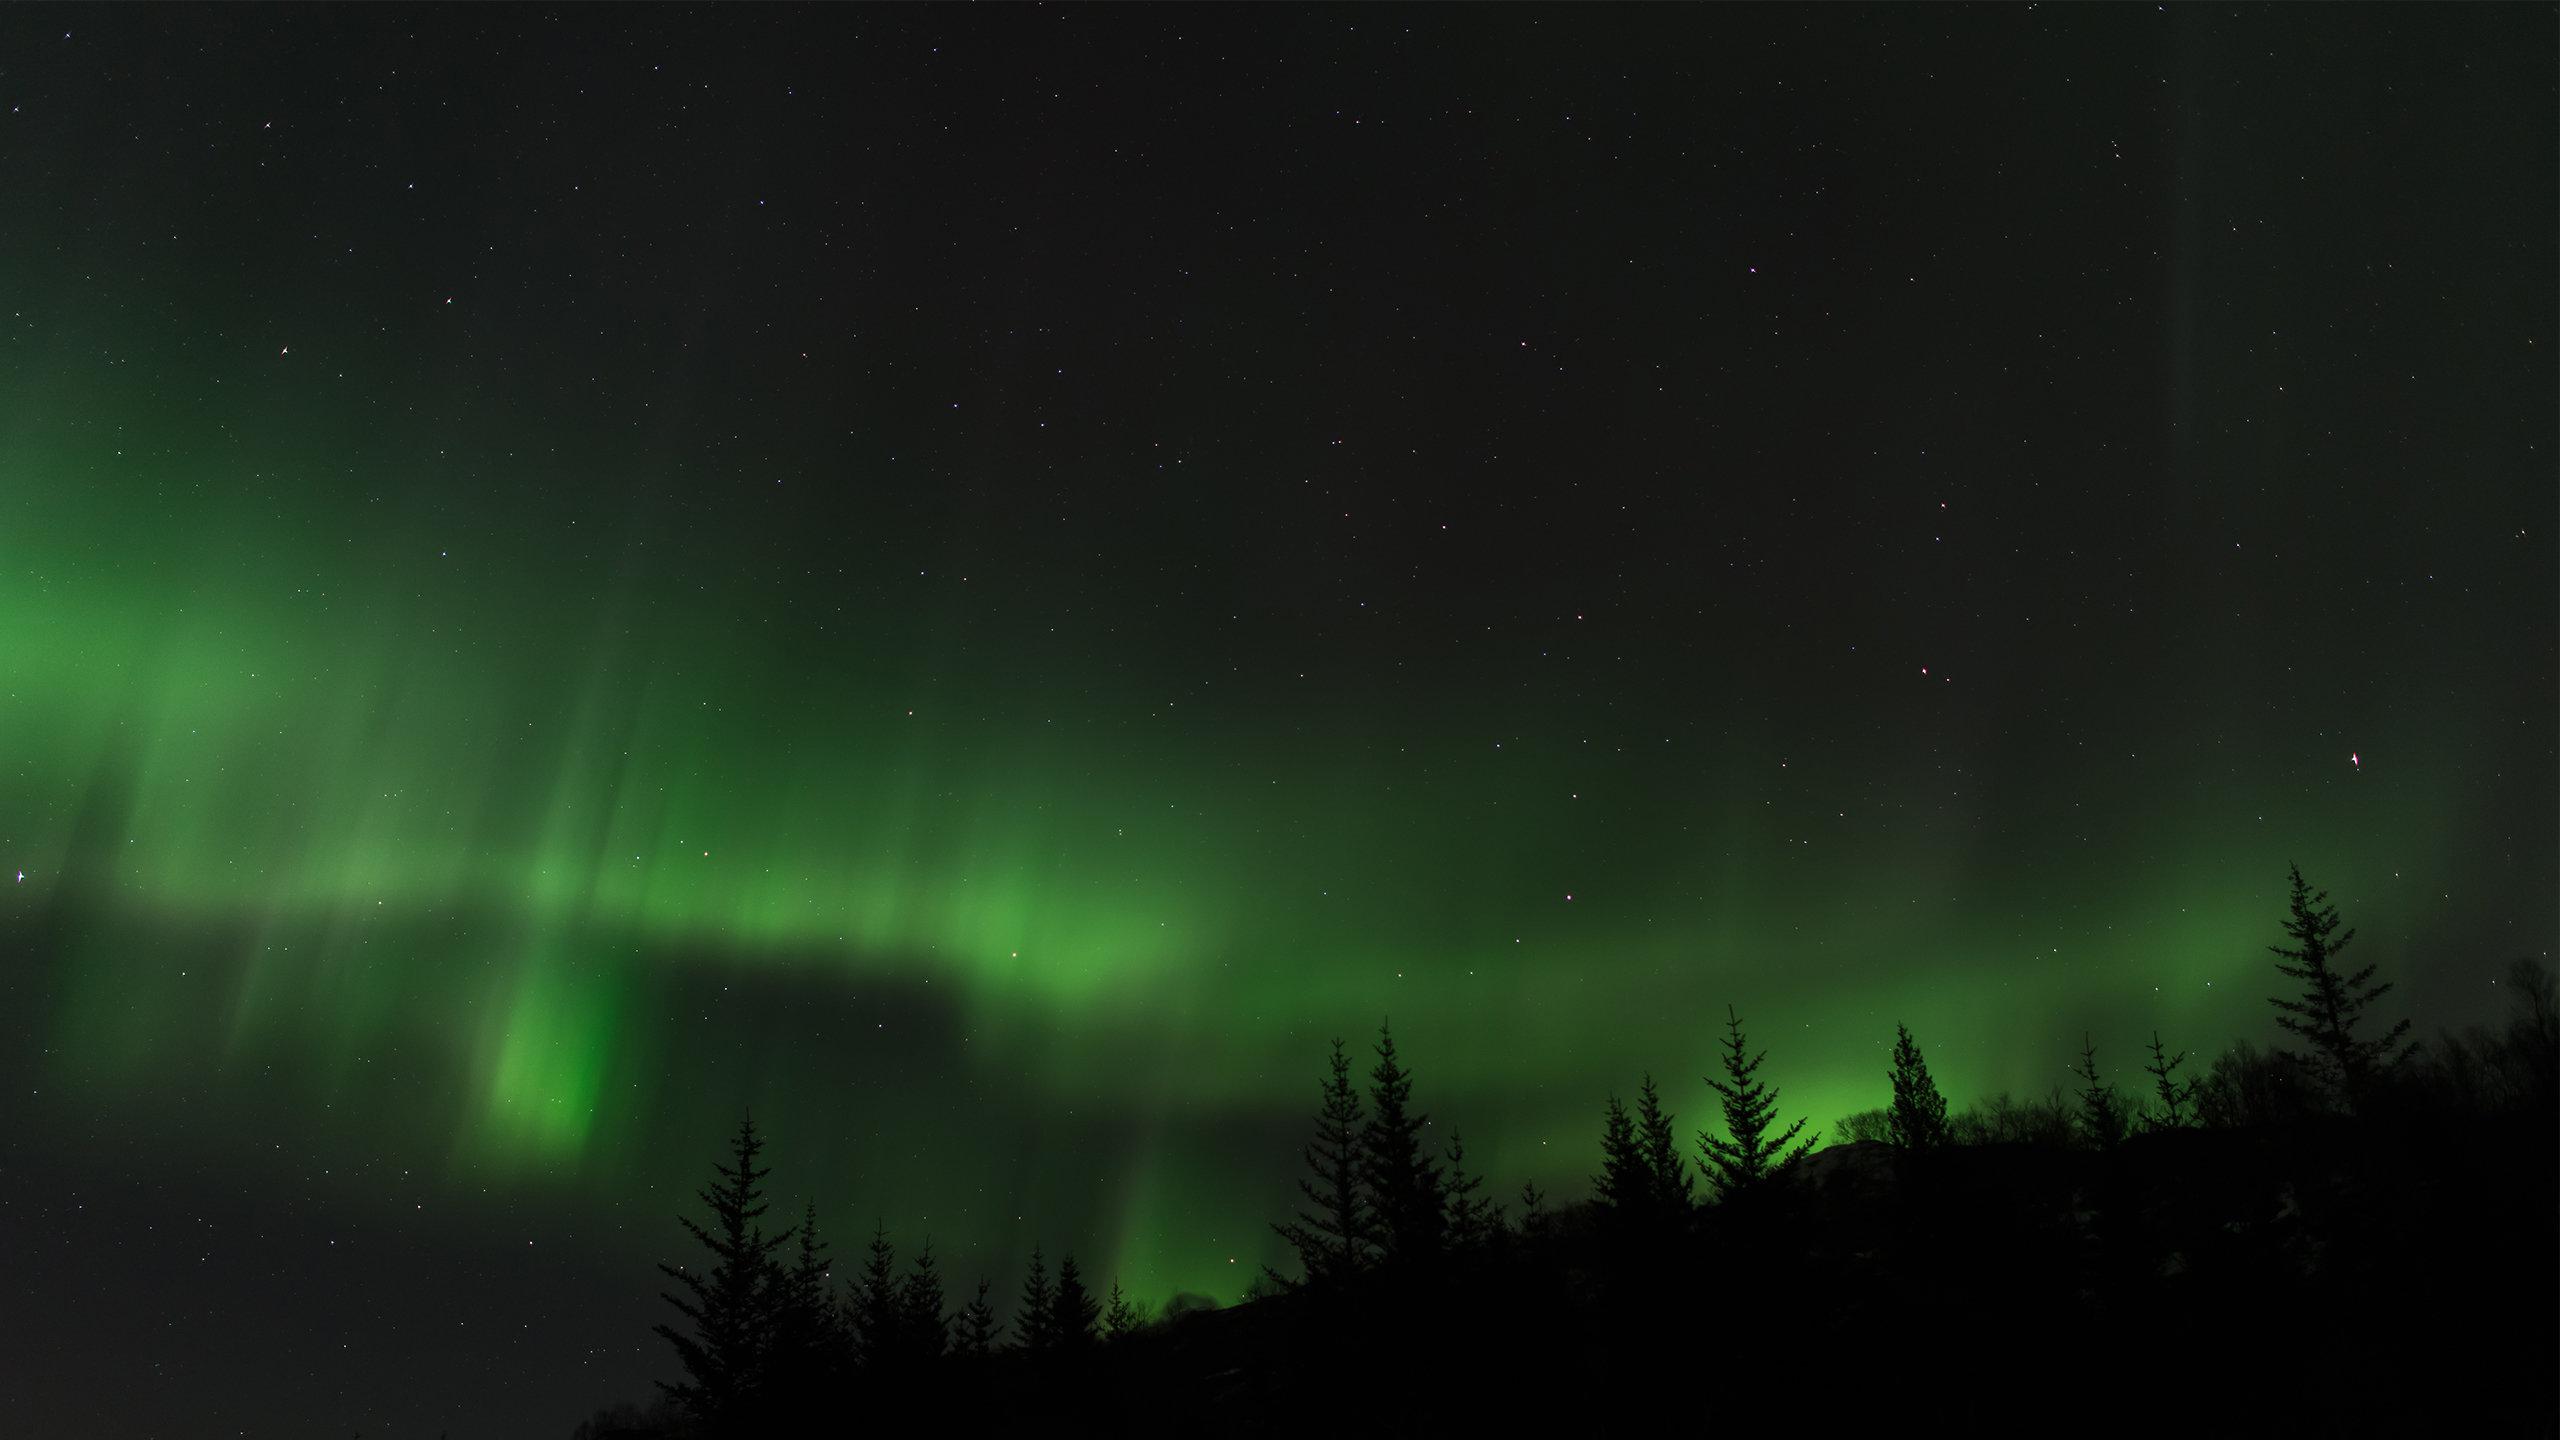 free aurora borealis high quality wallpaper id:283620 for hd